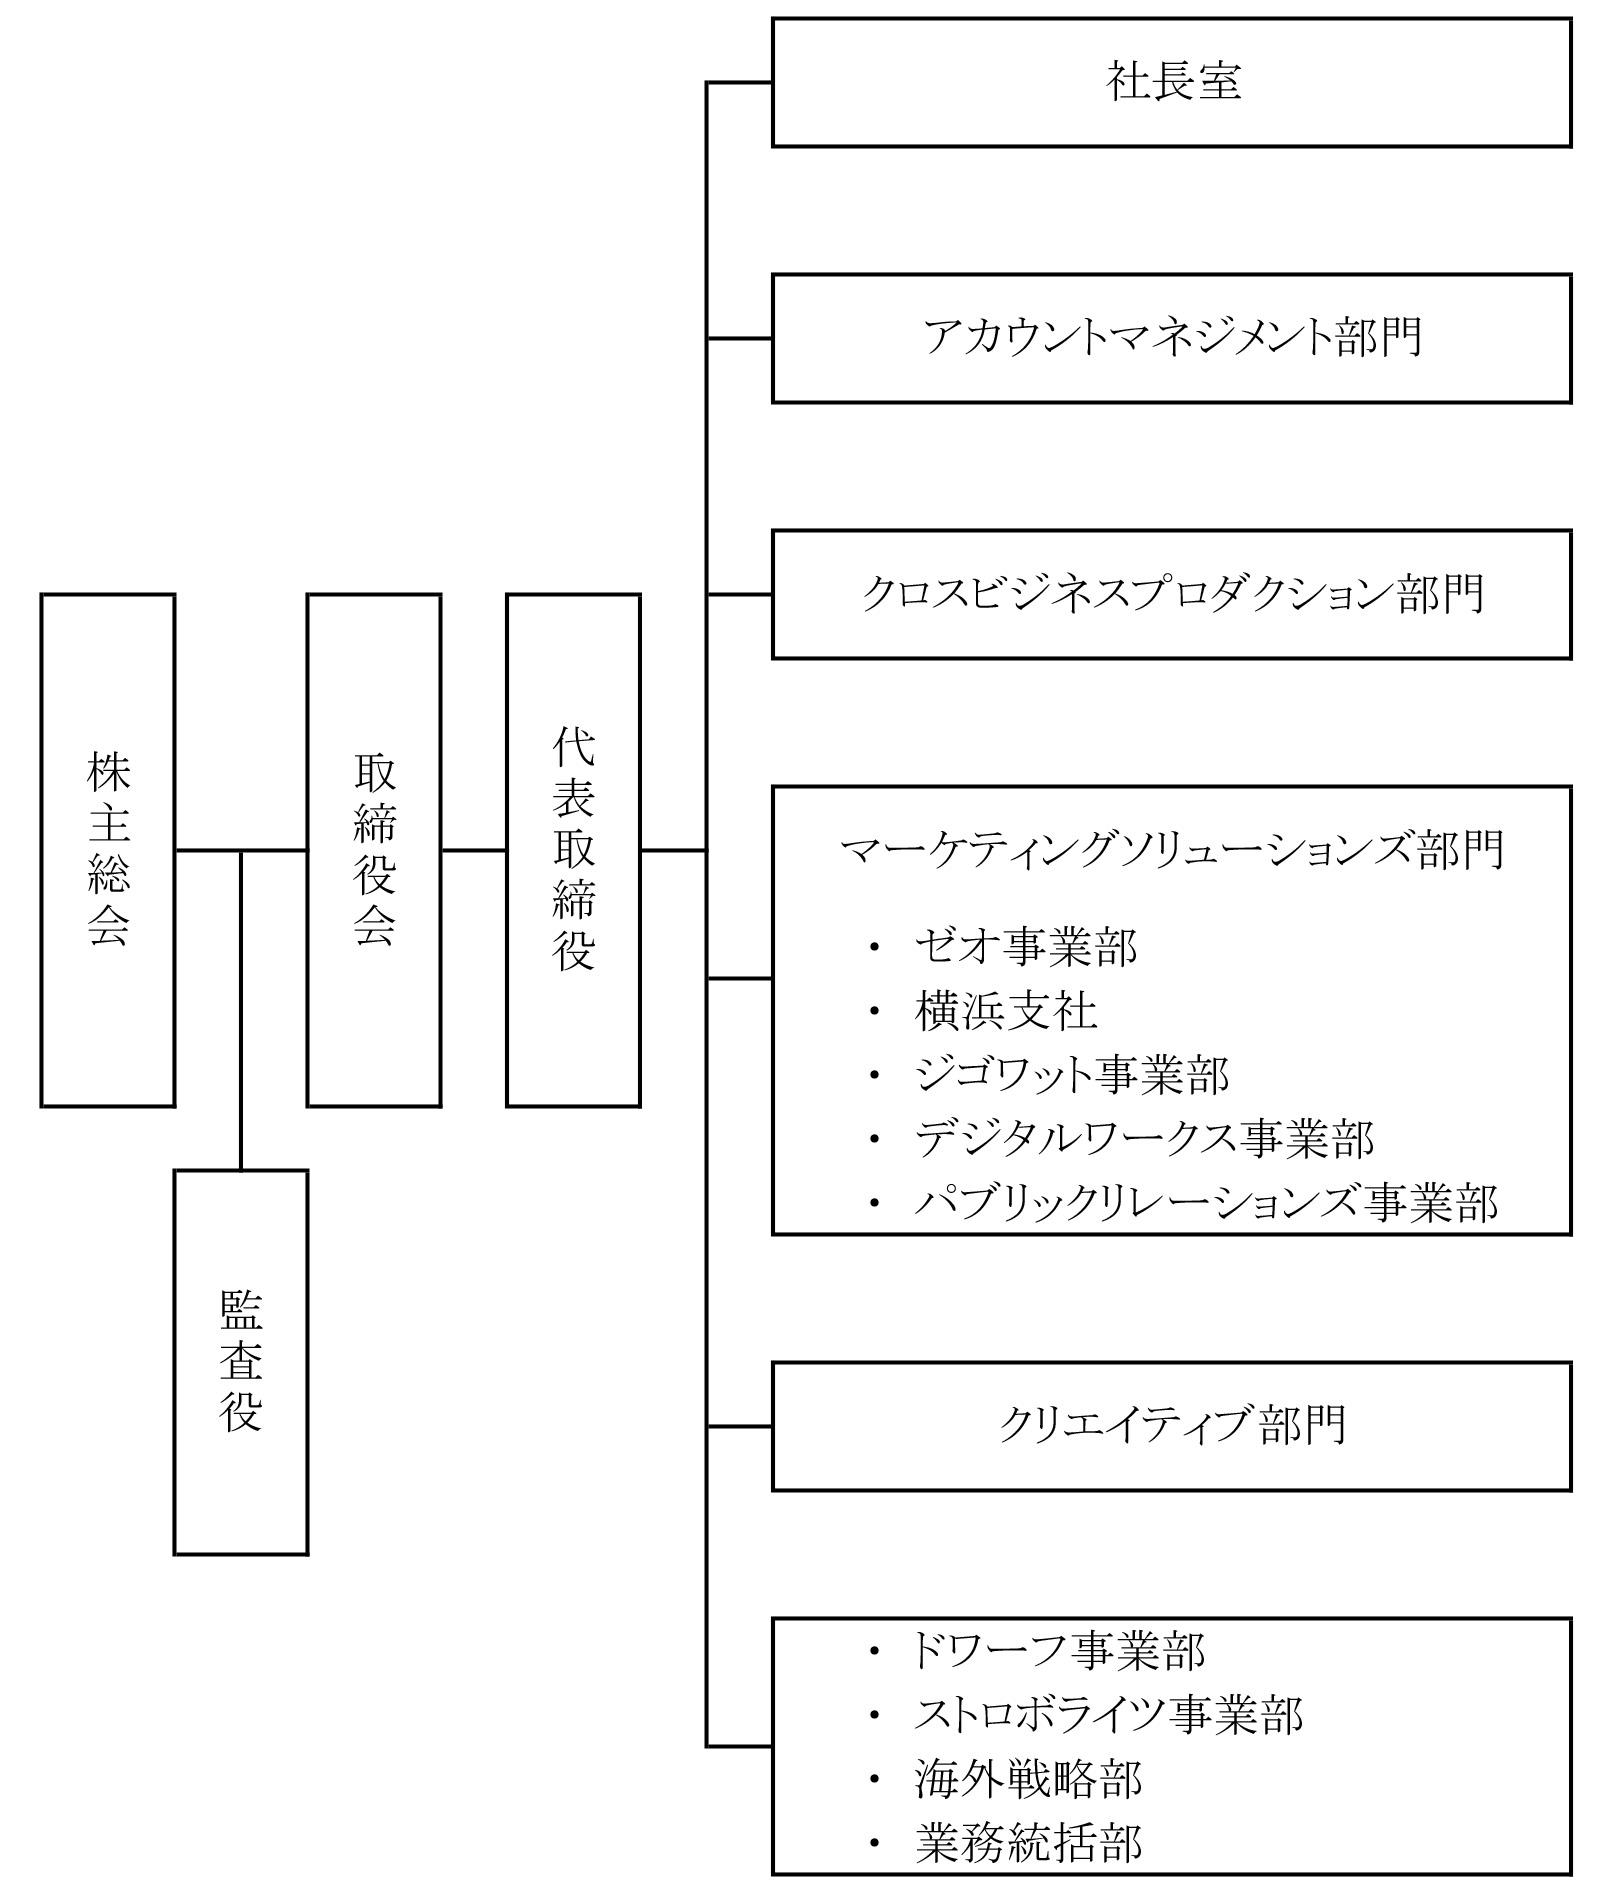 20211214_soshiki_xpd.jpg